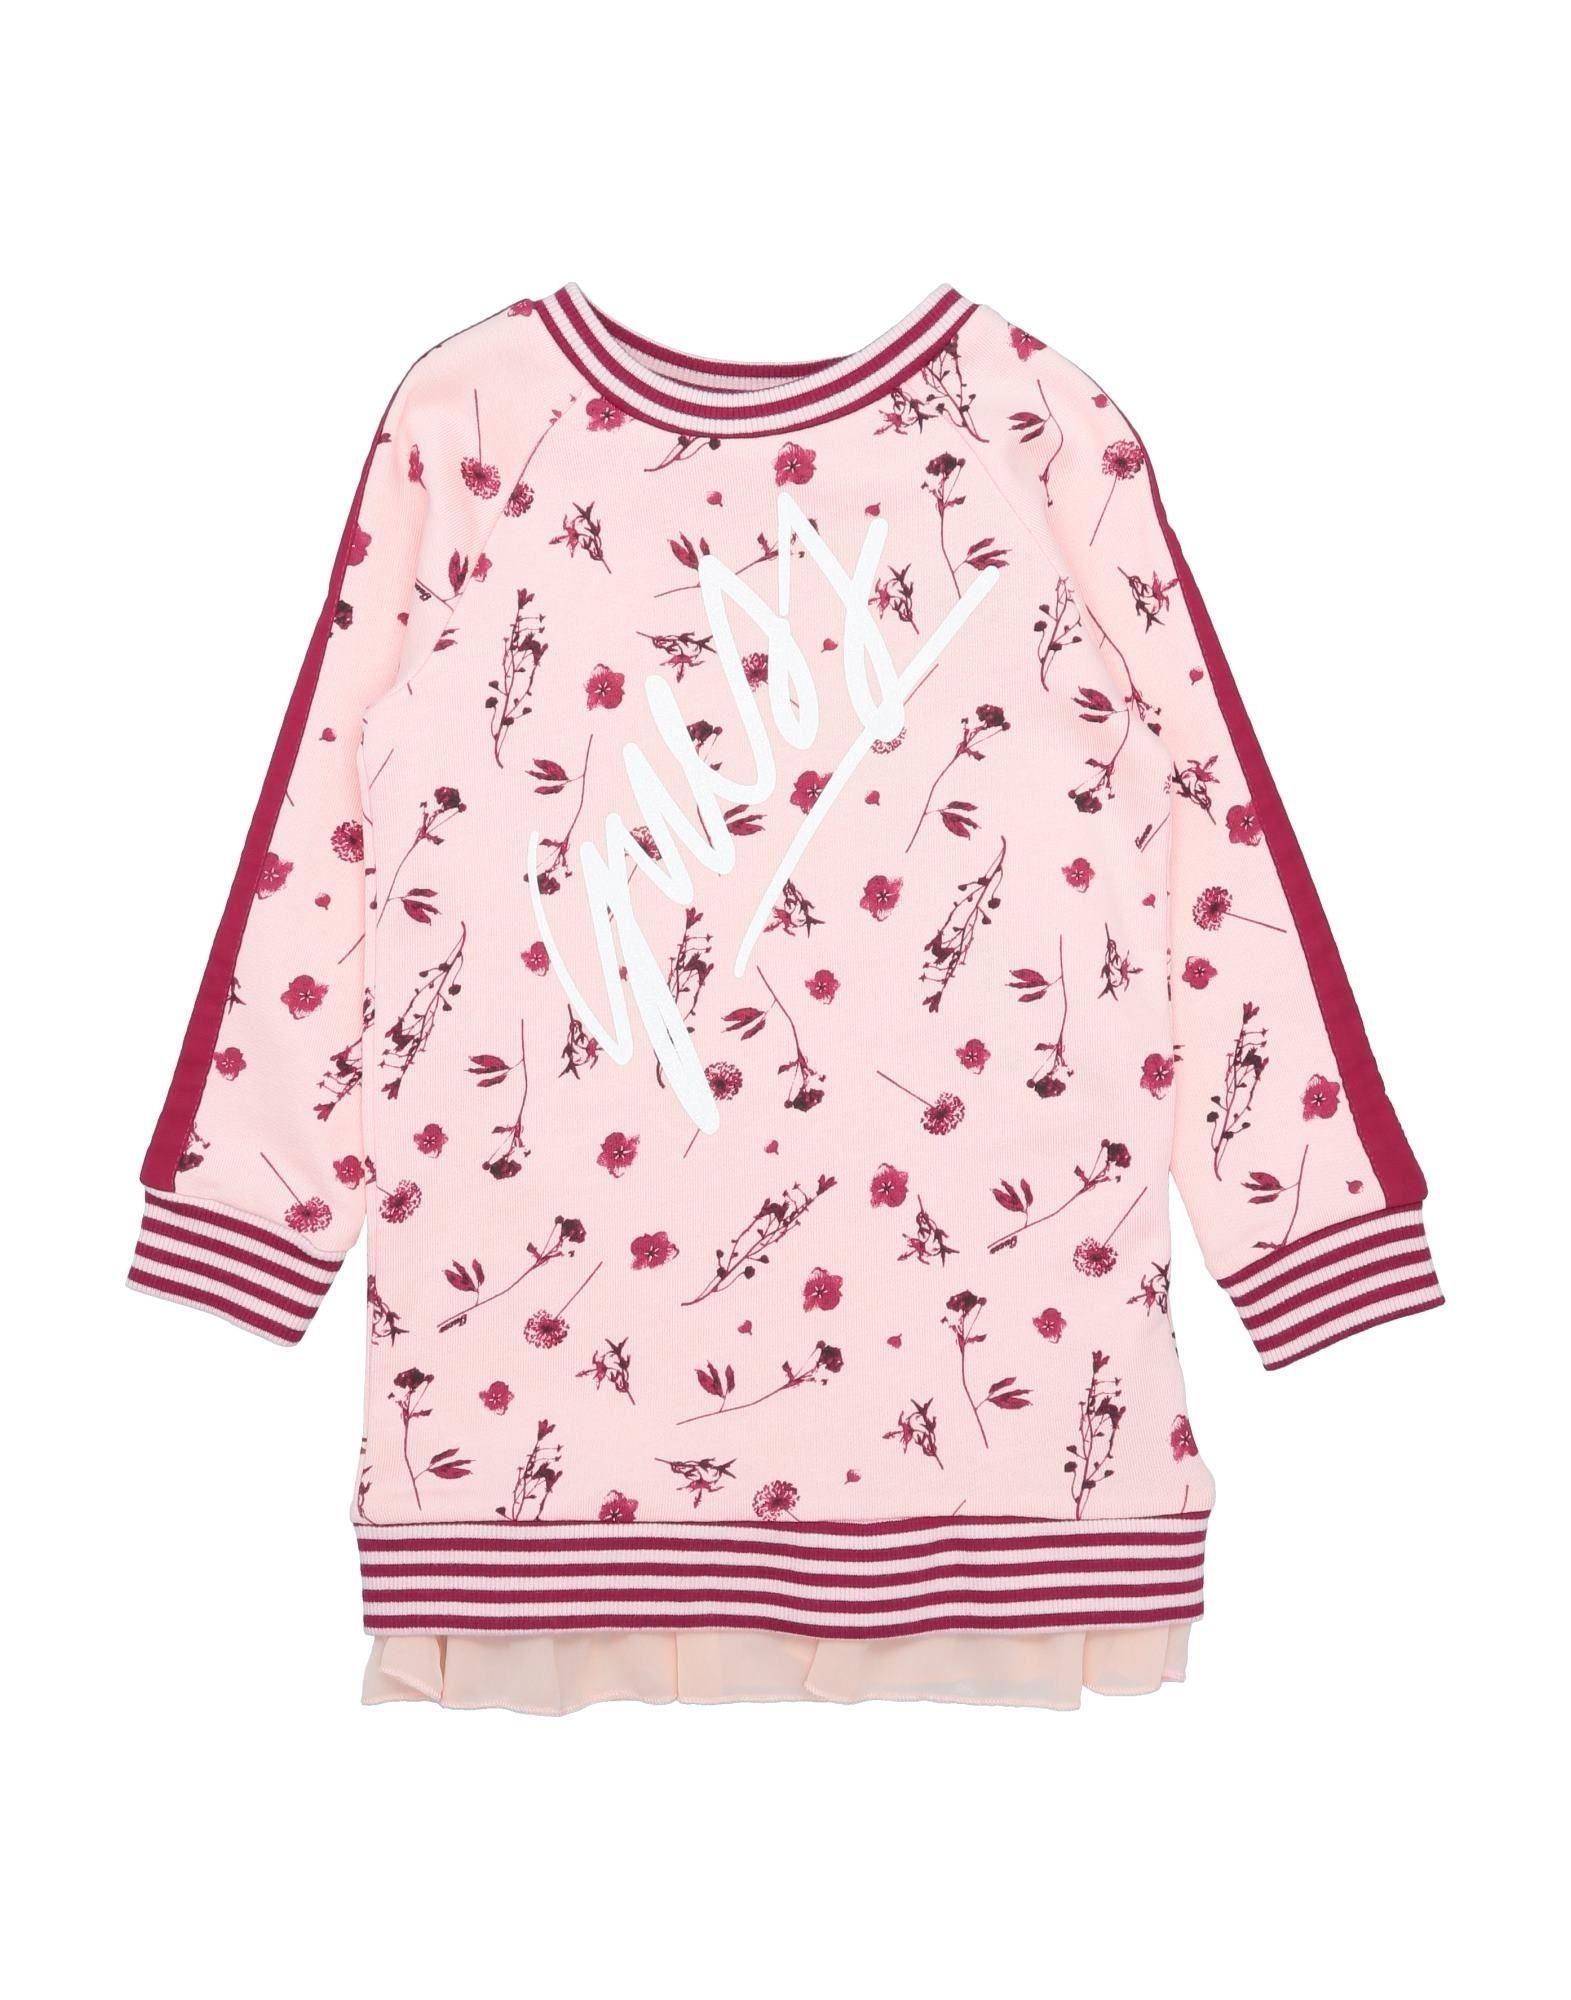 crepe, sweatshirt fleece, side seam stripes, logo, floral design, round collar, long sleeves, french